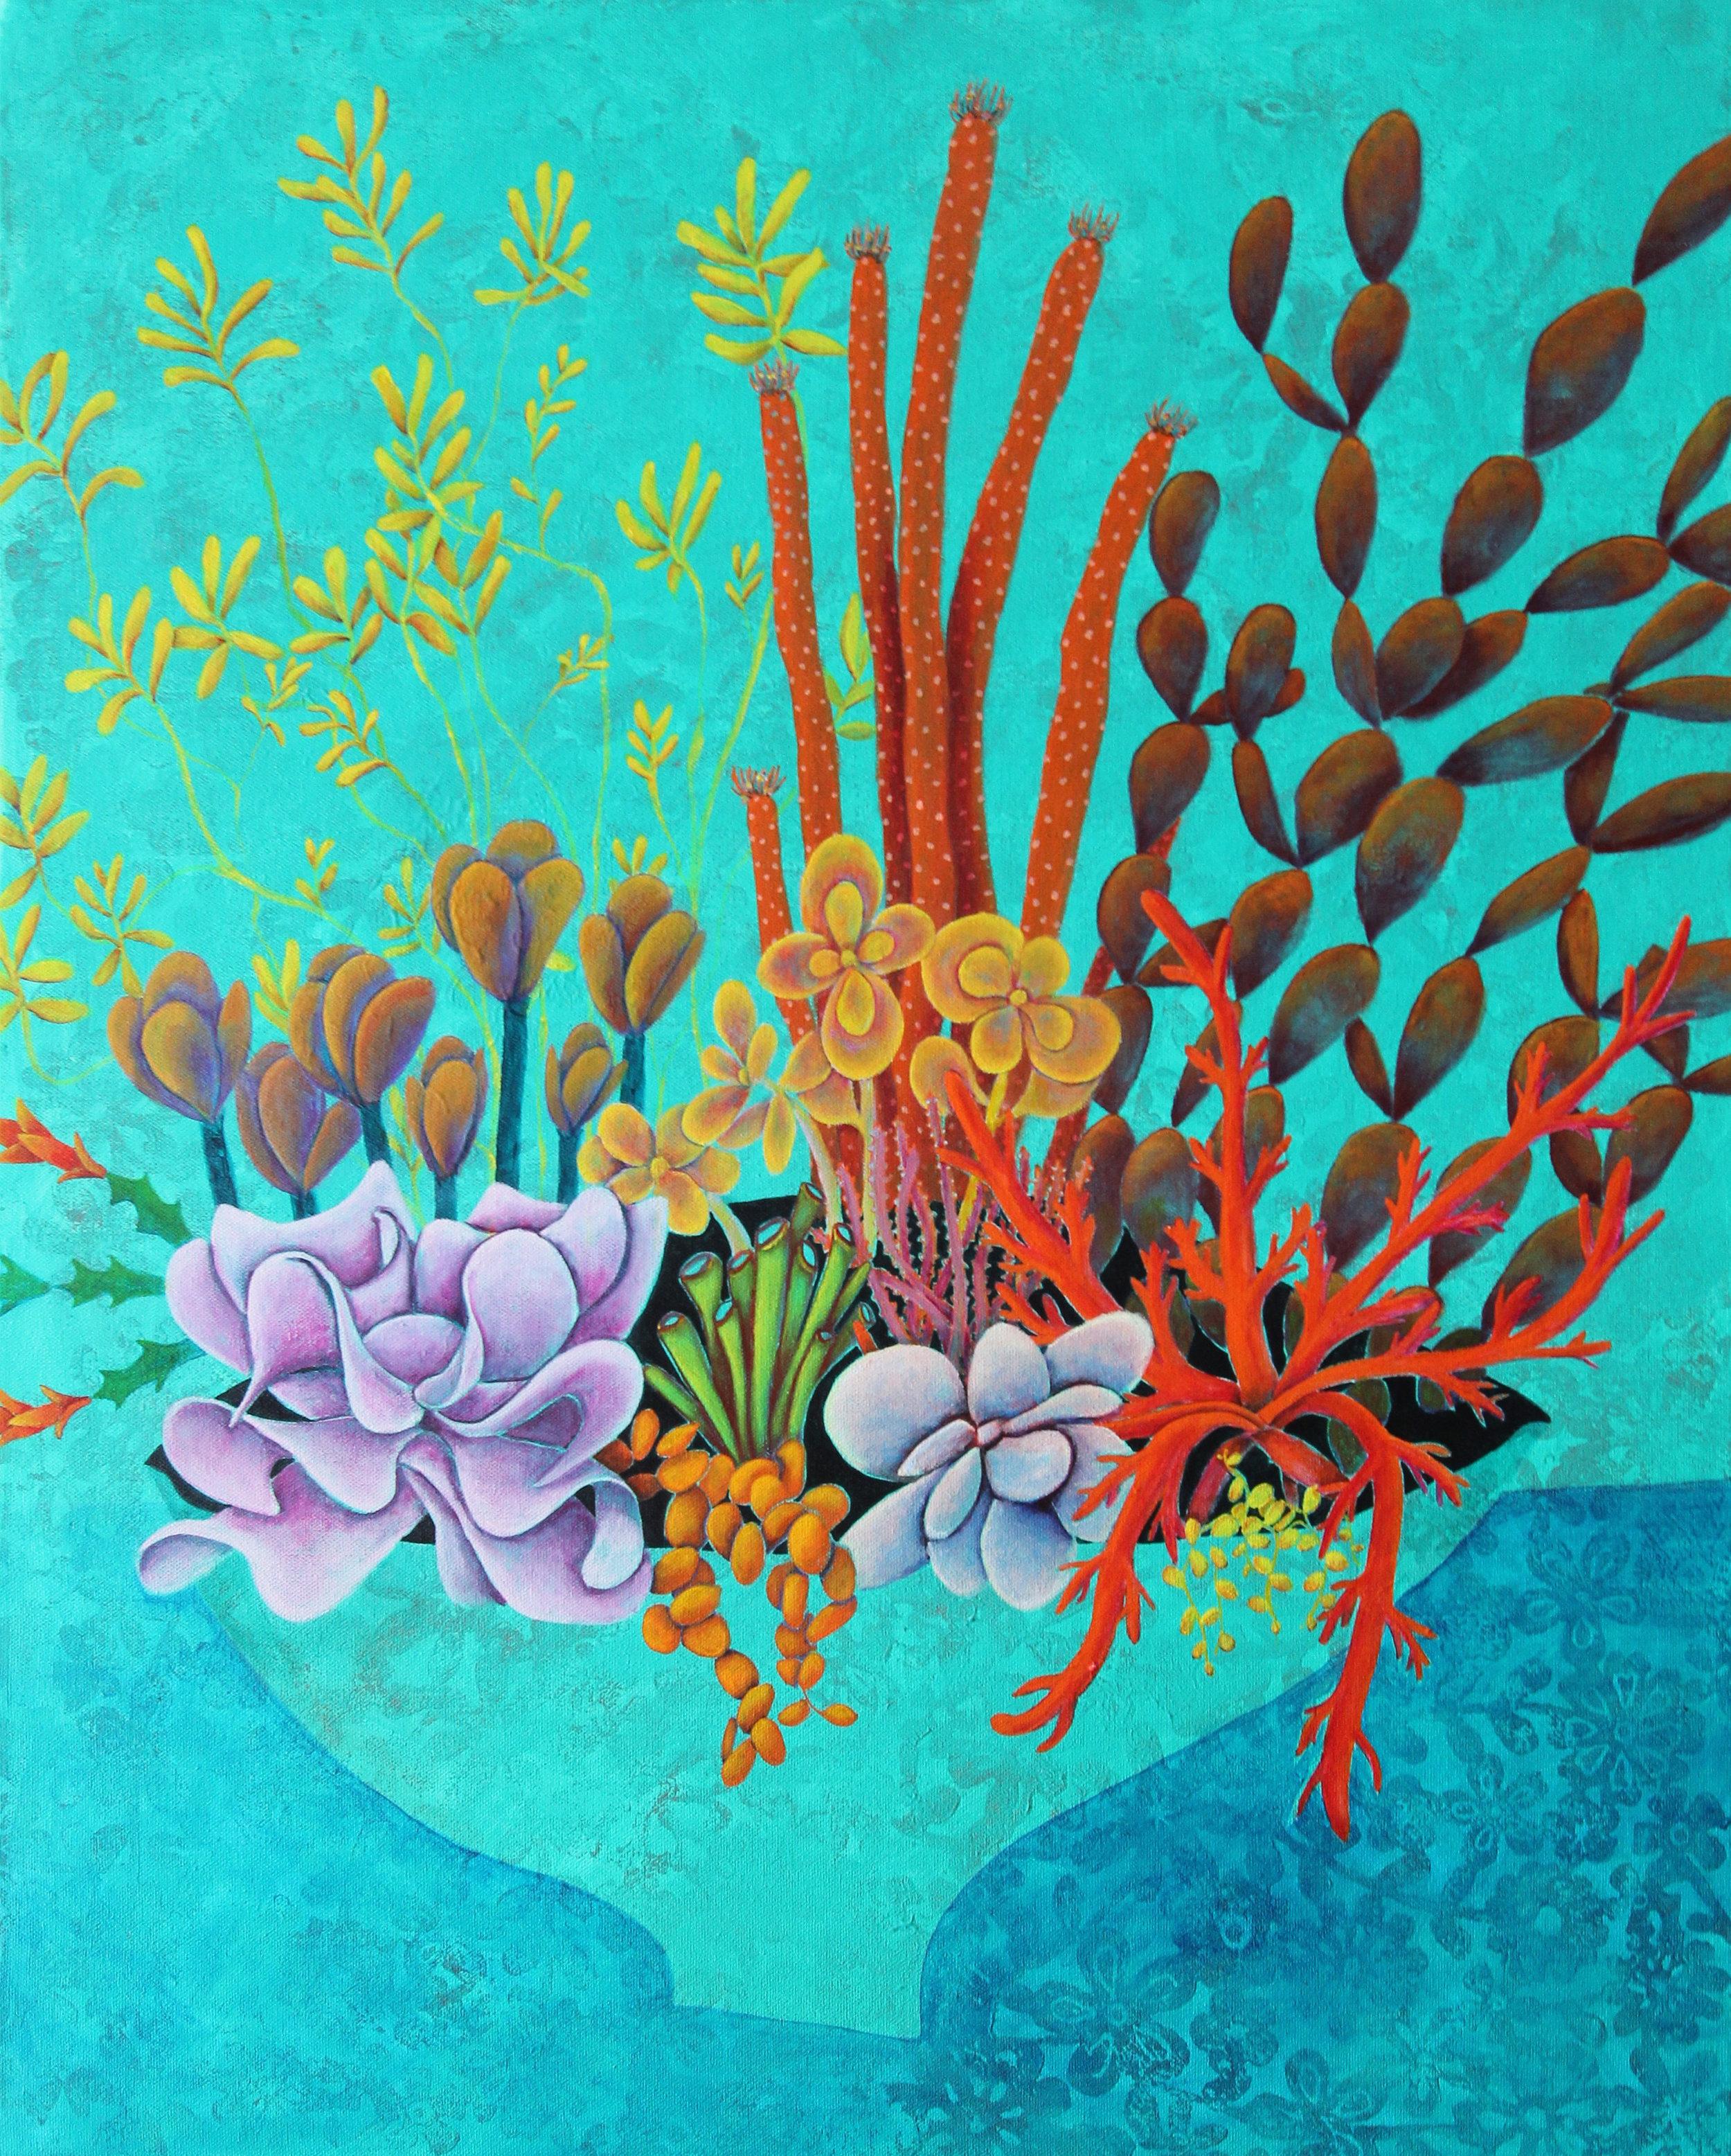 janine gasbarri. flowers on blue.2018.acrylic on canvas.jpg